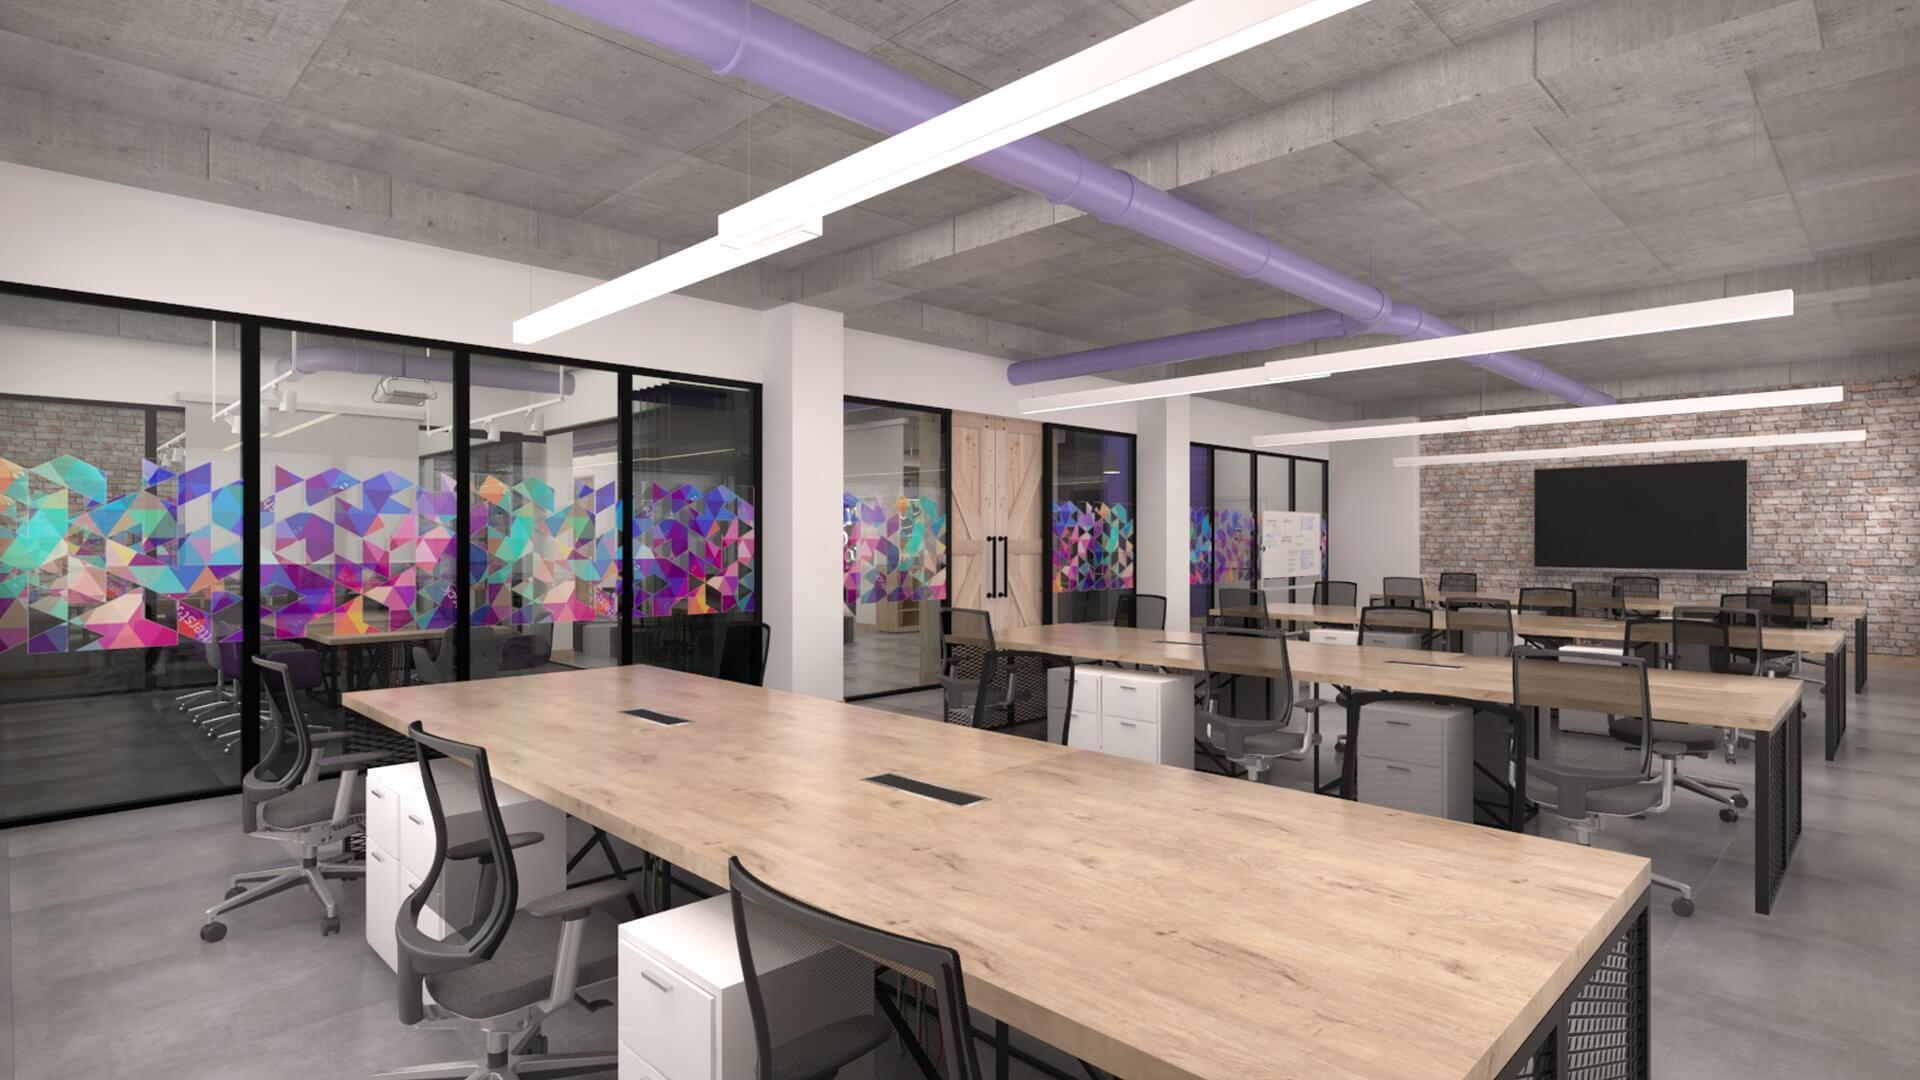 Ofis İç Mimari Dekorasyonu  Connected2.me C2M Bilişim